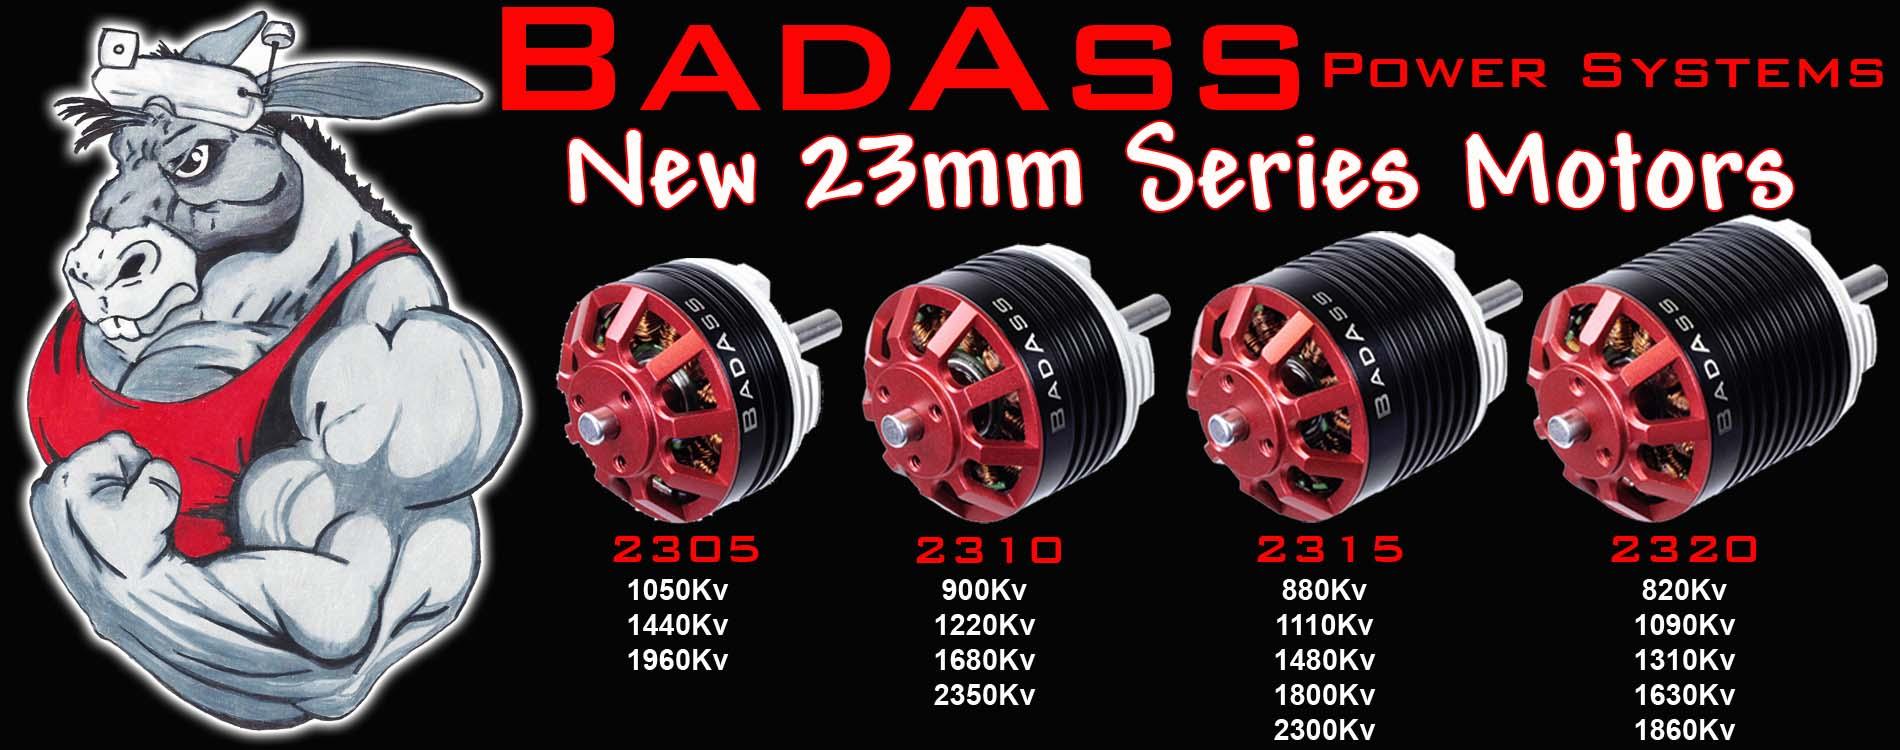 BadAss 23mm Series Motors